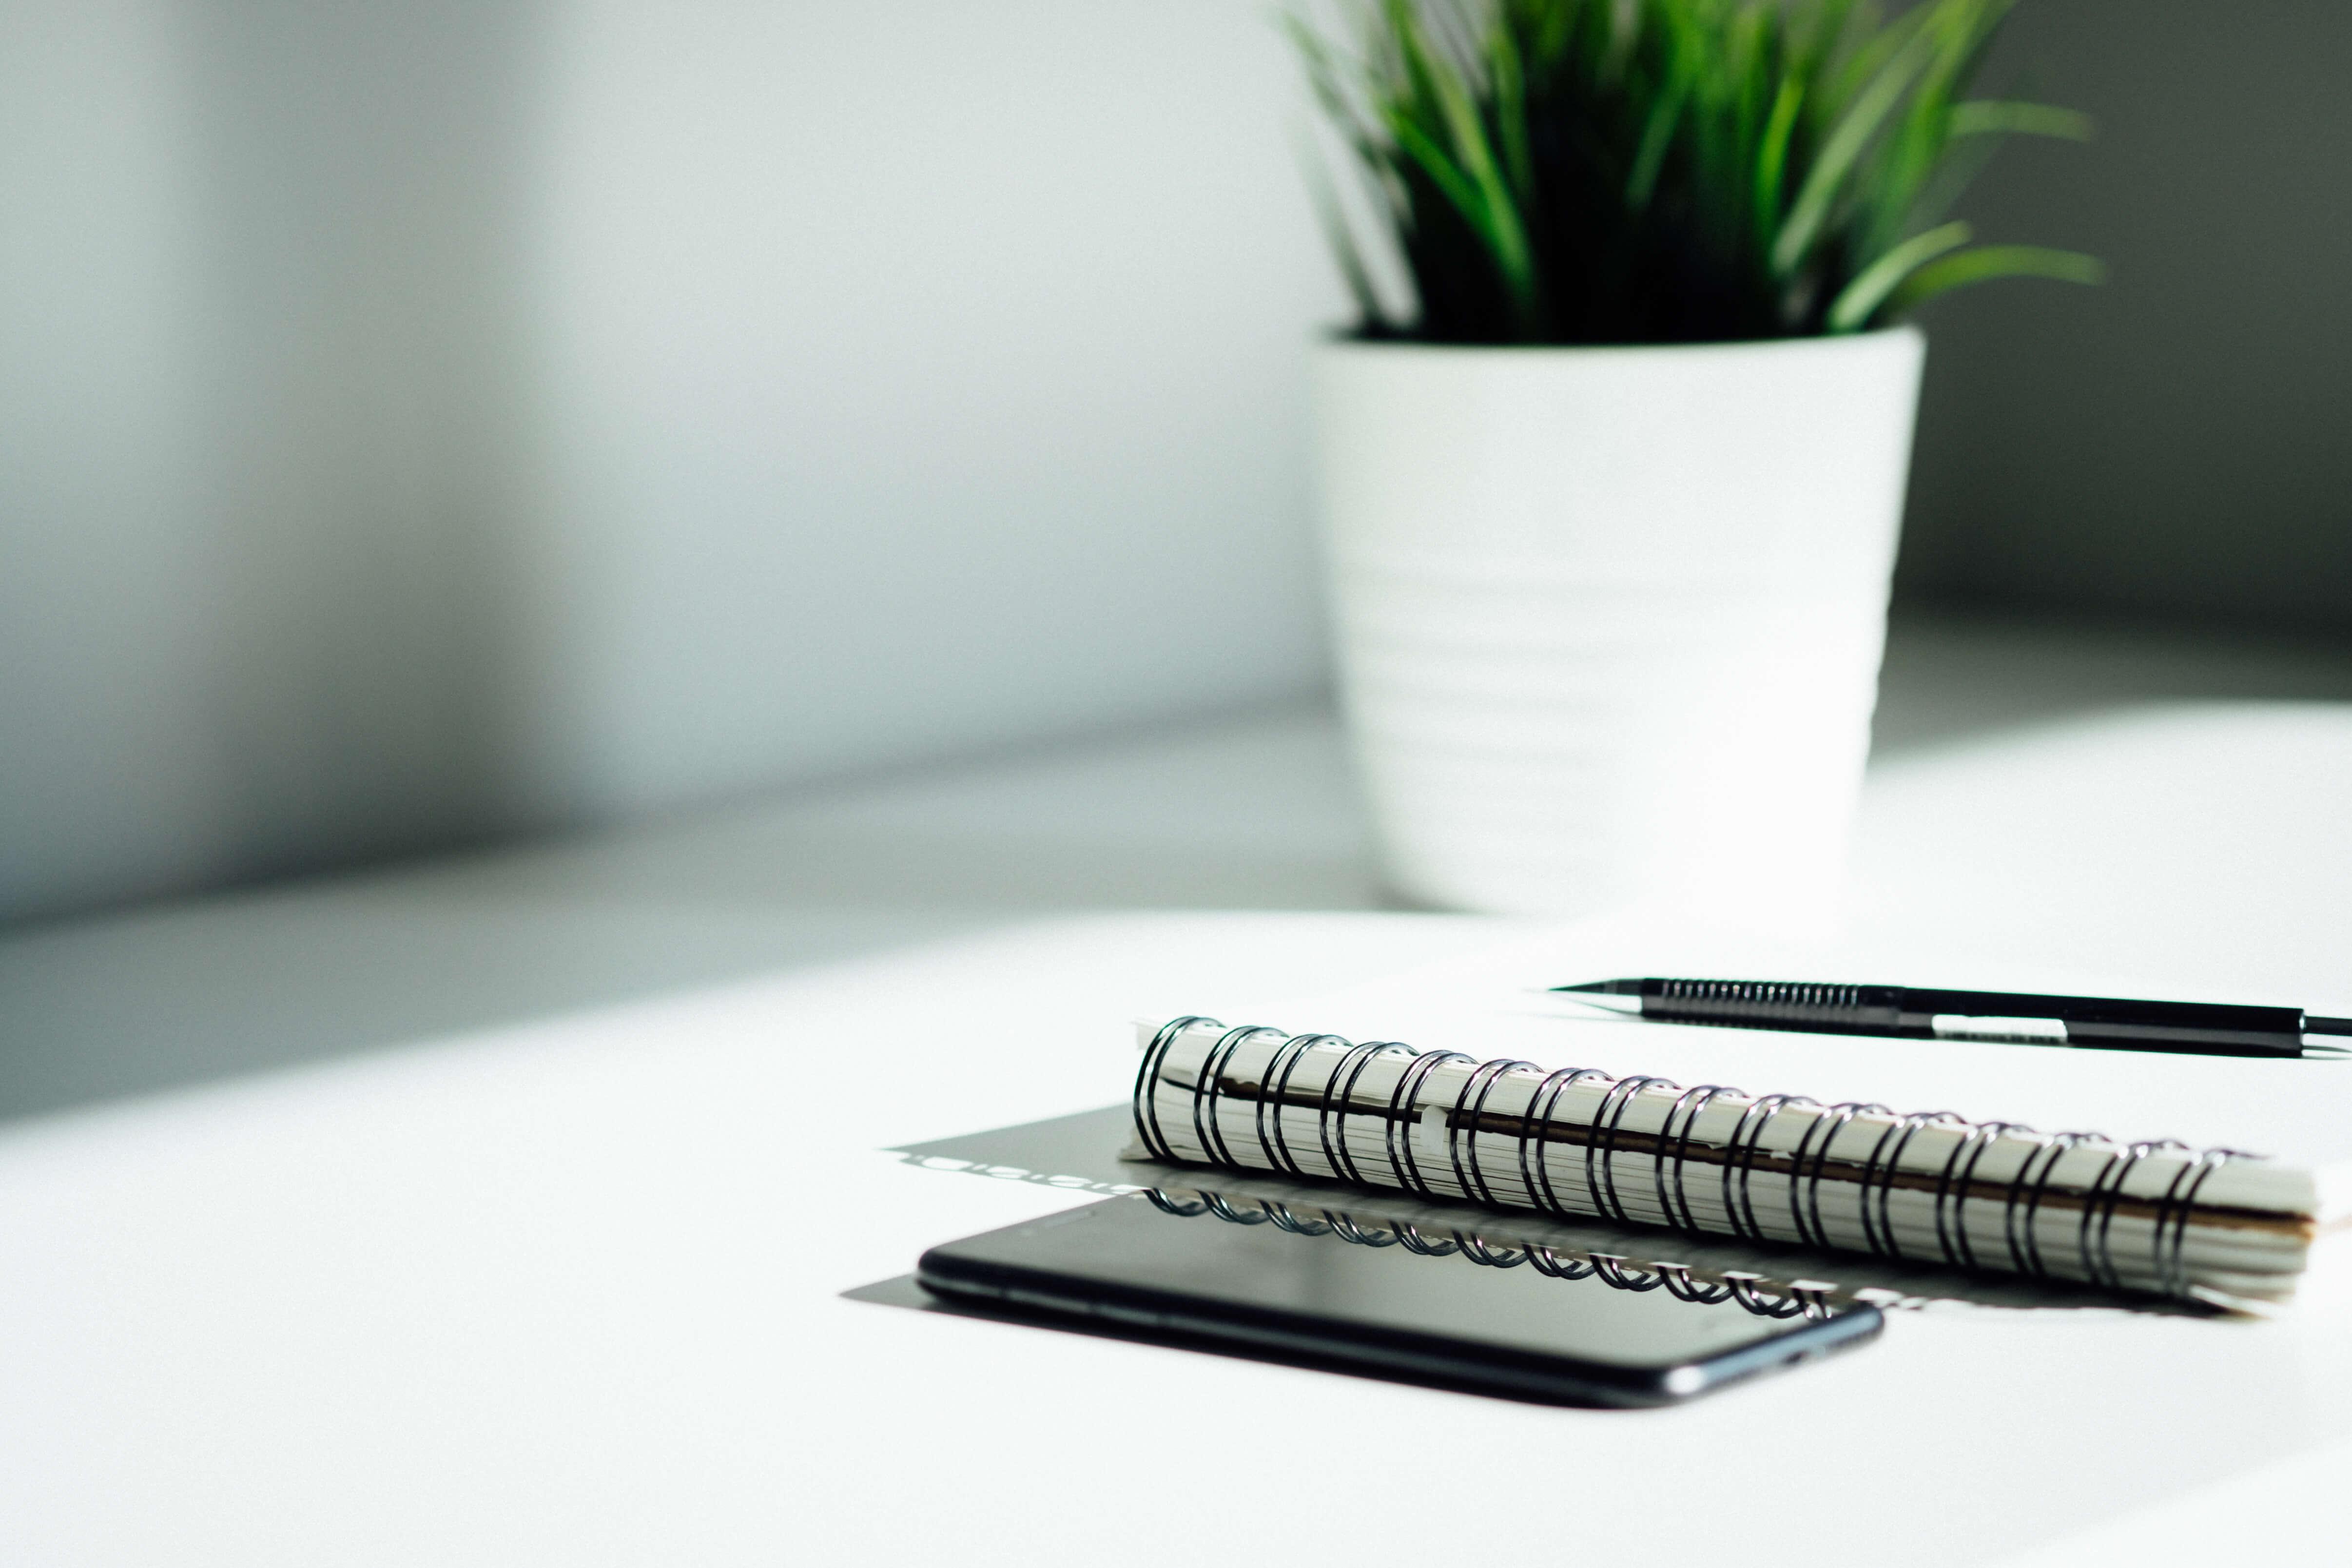 web_marketing本格的なホームページに必要な、「KPI・KGI」